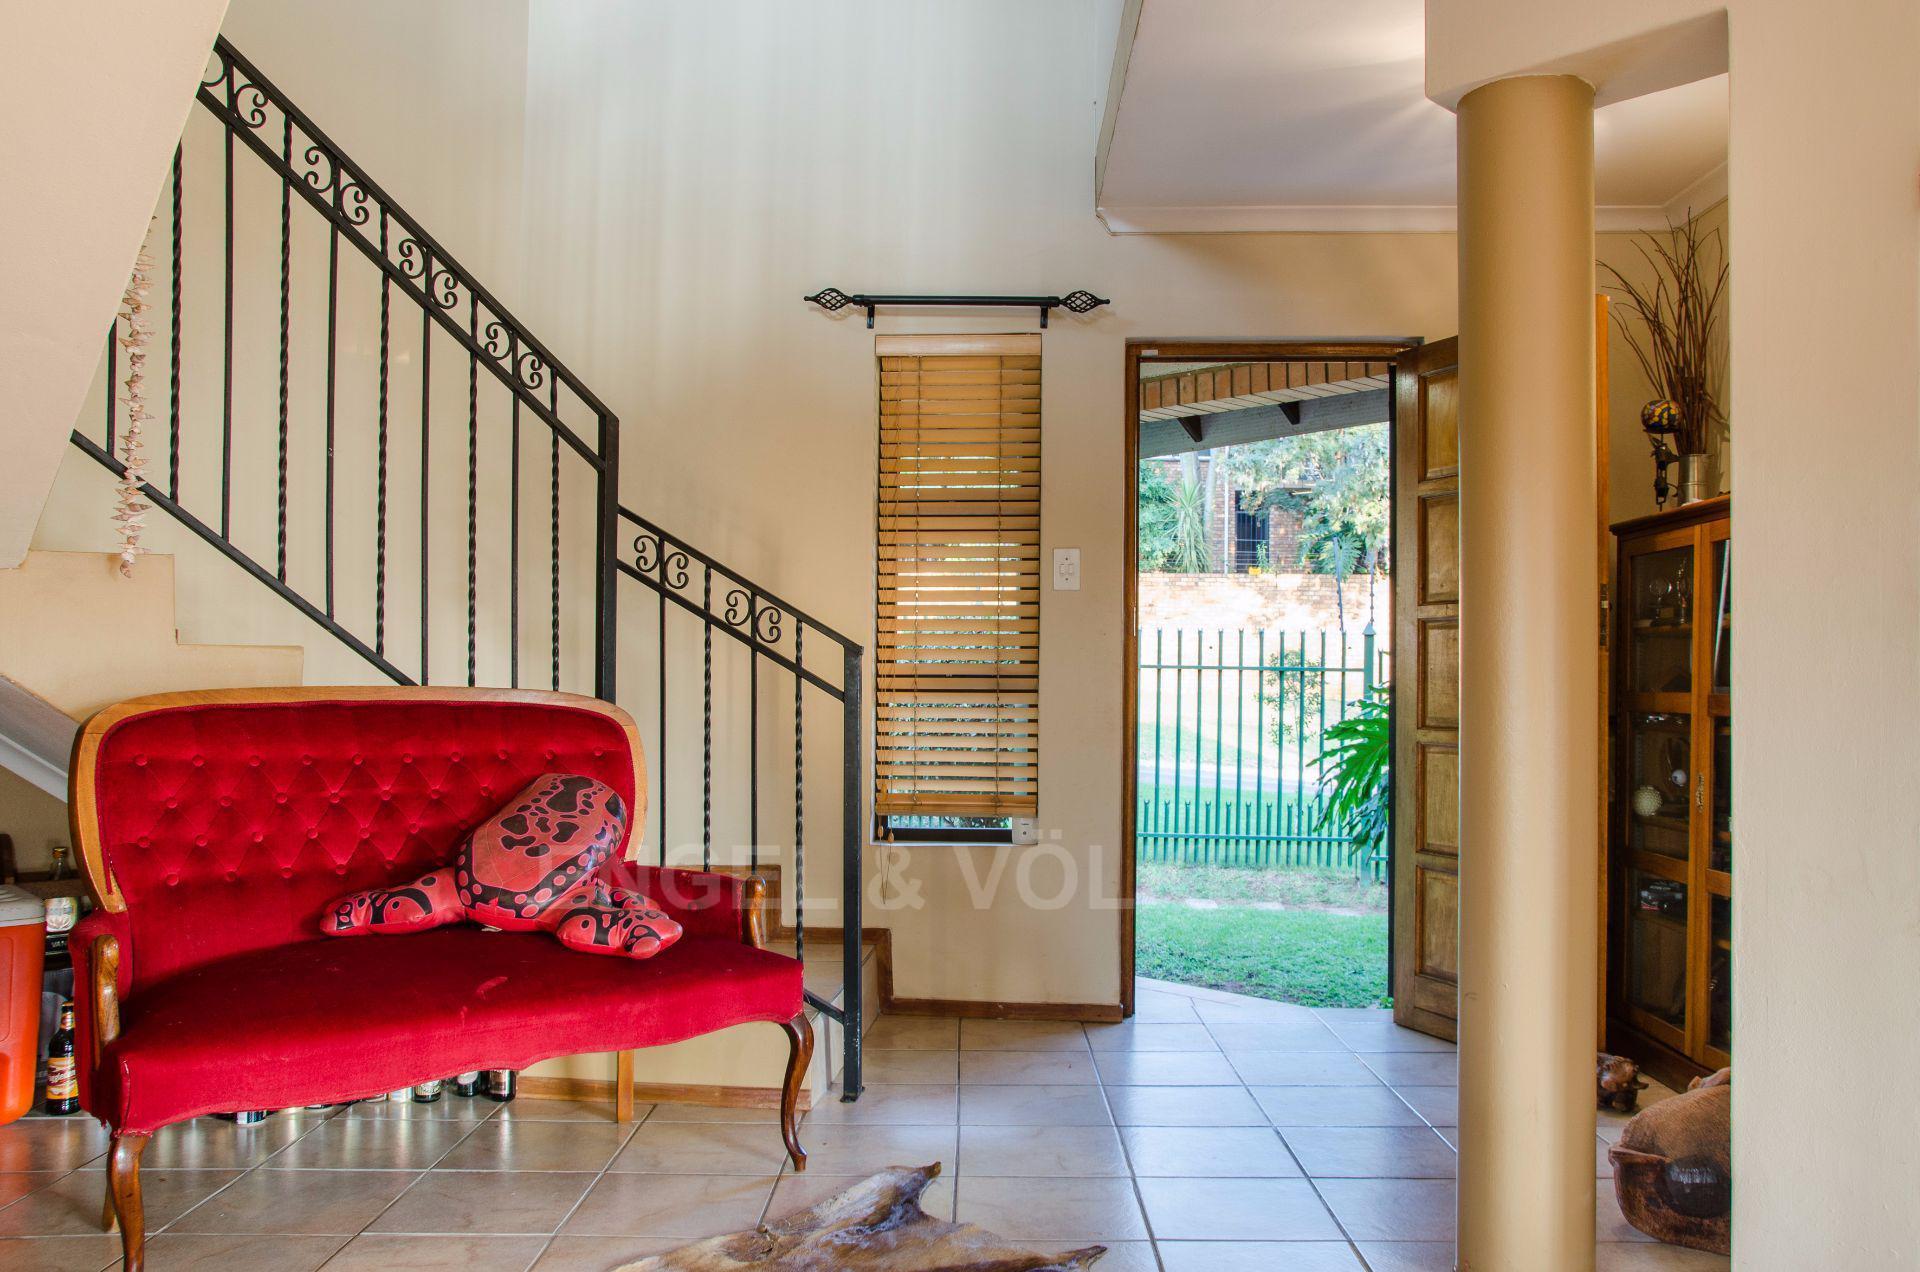 Pretoria, Erasmuskloof Property  | Houses For Sale Erasmuskloof, ERASMUSKLOOF, House 4 bedrooms property for sale Price:2,950,000